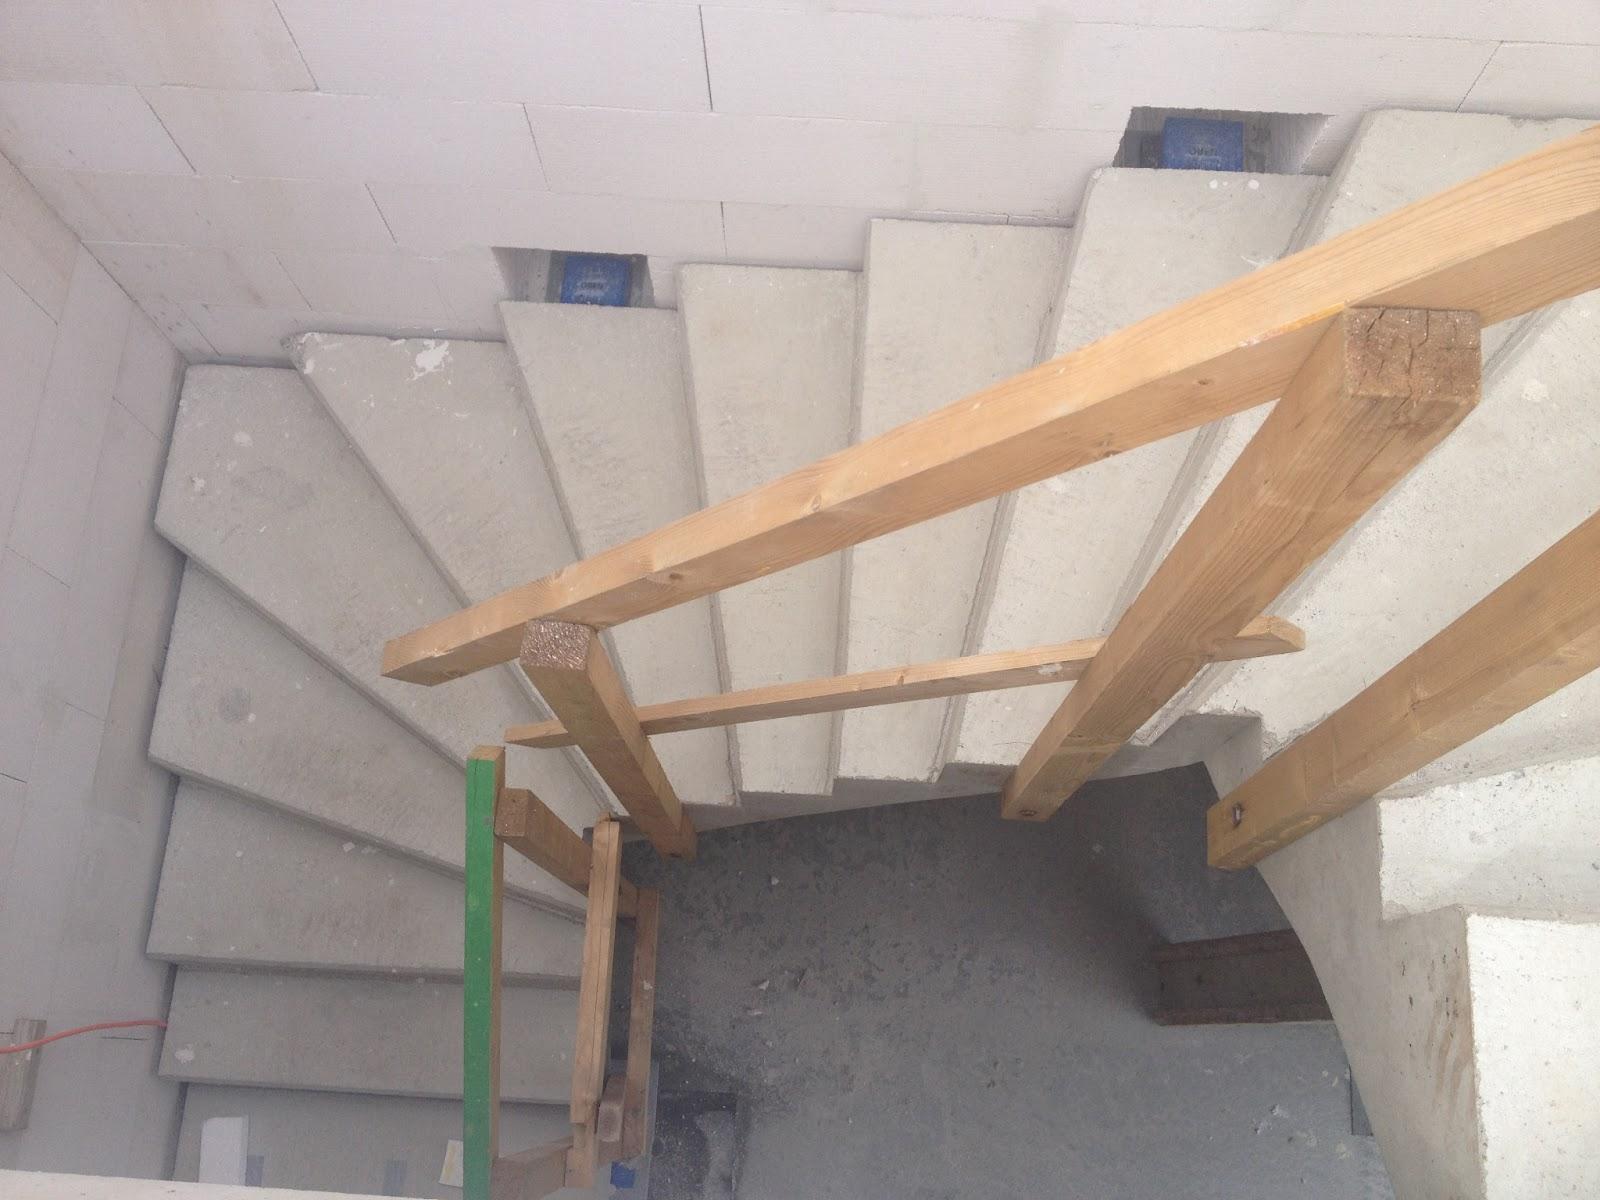 kleine treppe bauen tx39 kyushucon. Black Bedroom Furniture Sets. Home Design Ideas